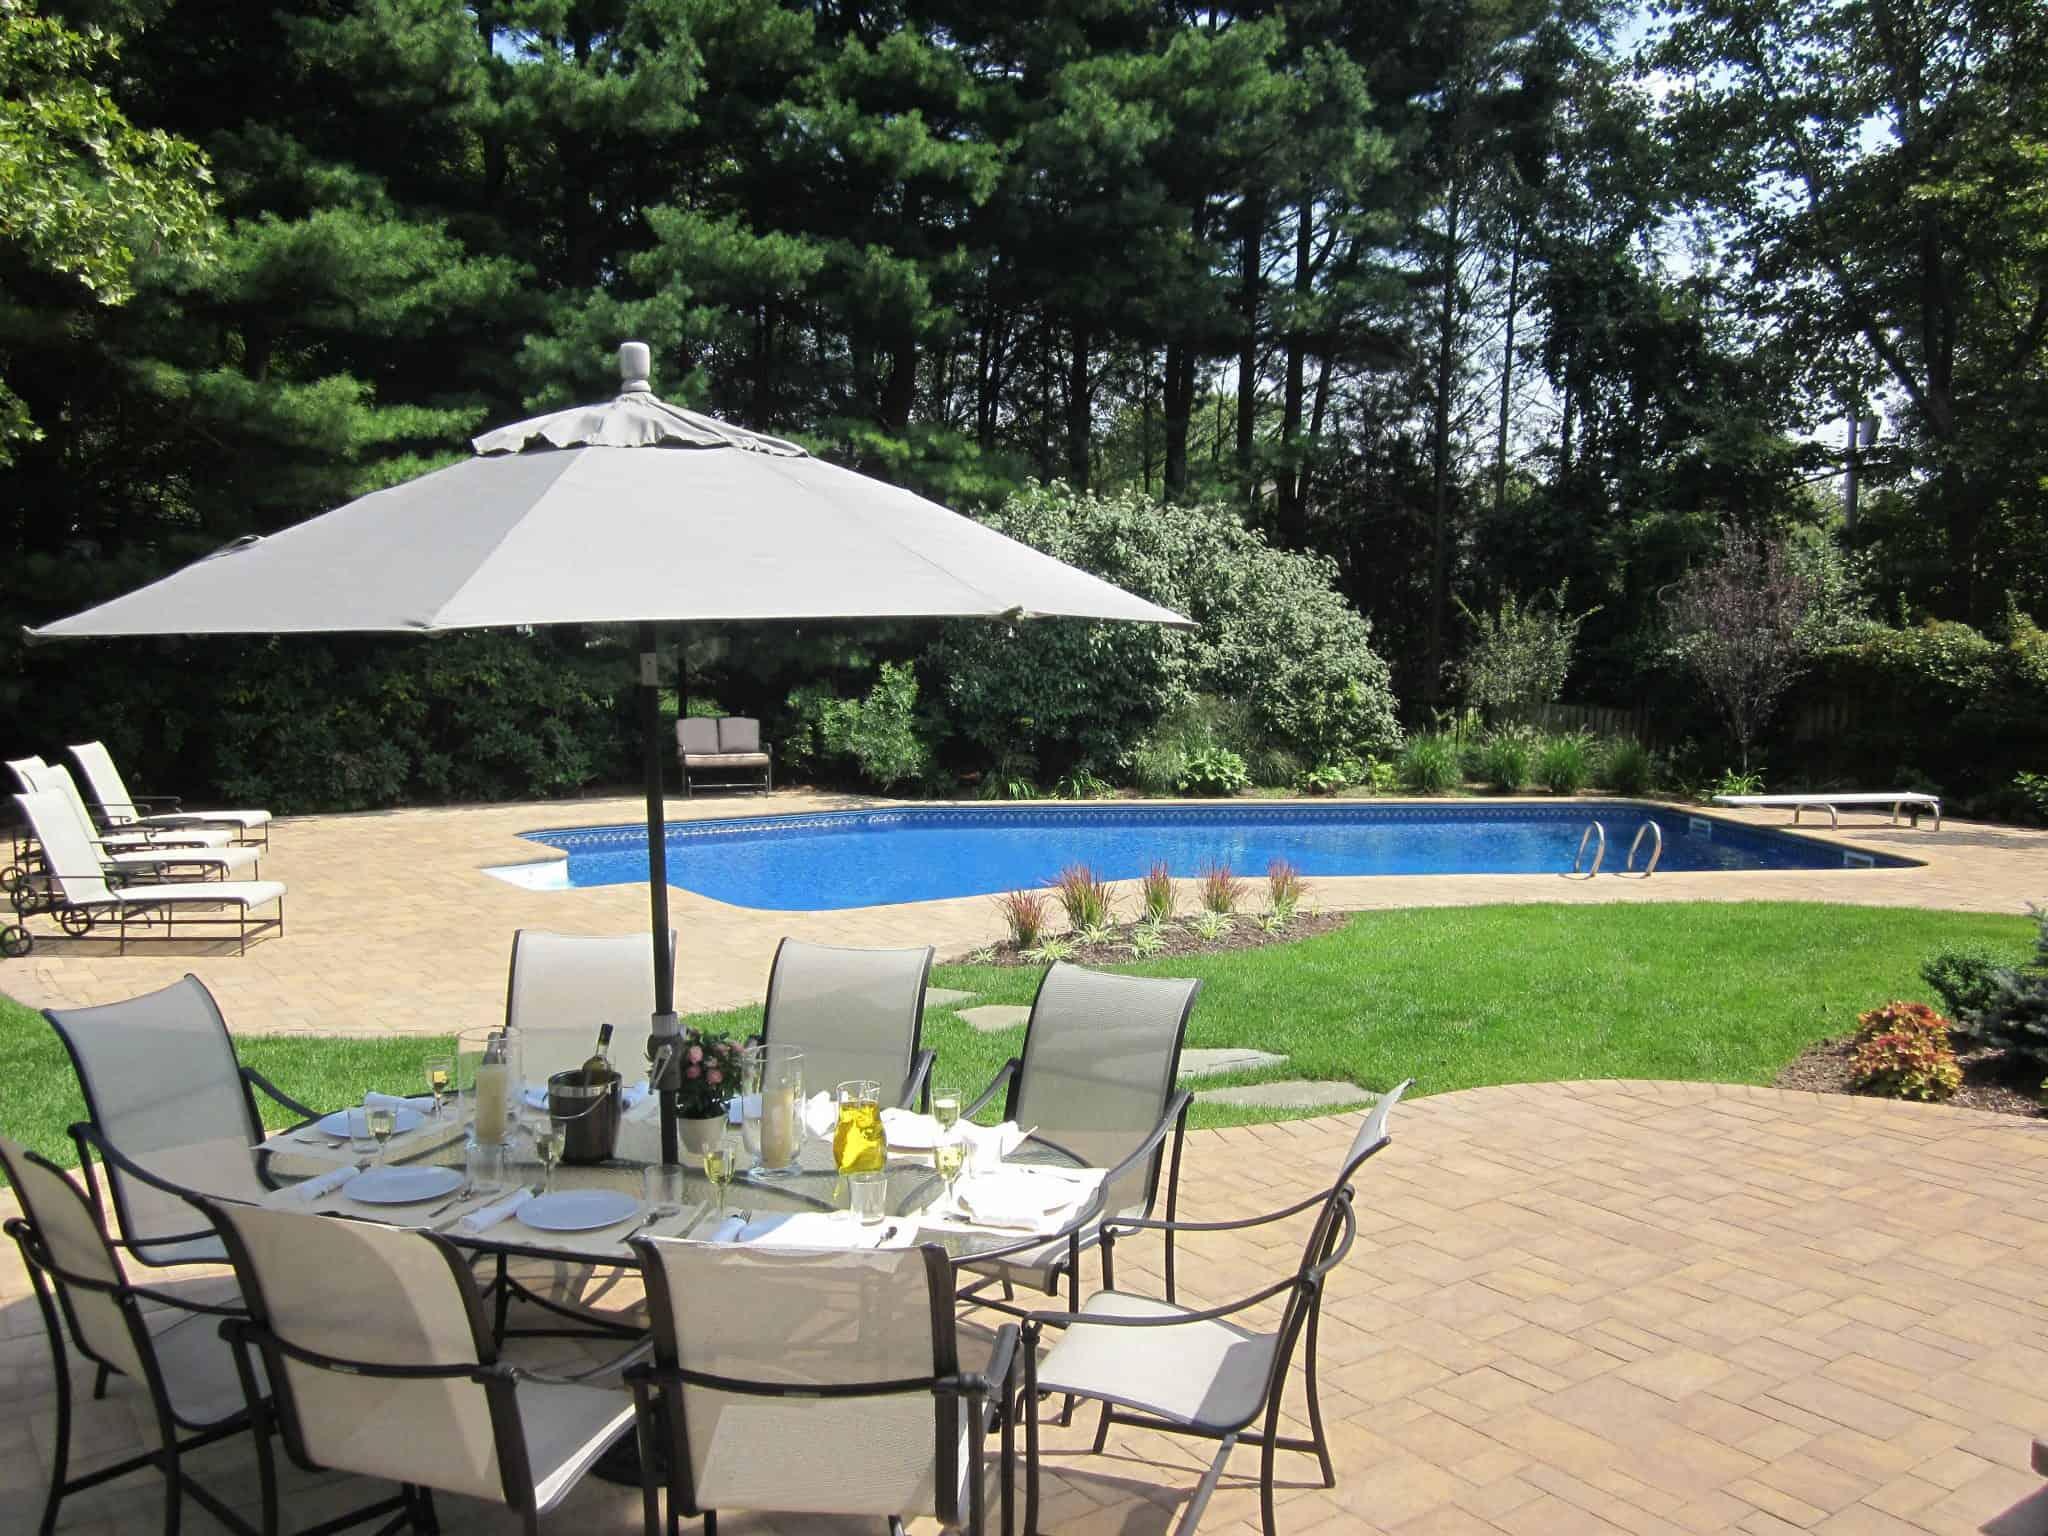 Paver Patio - Cambridge Ledgestone Pool Patio - Sahara Chestnut- Random Pattern - Dix Hills, Long Island NY